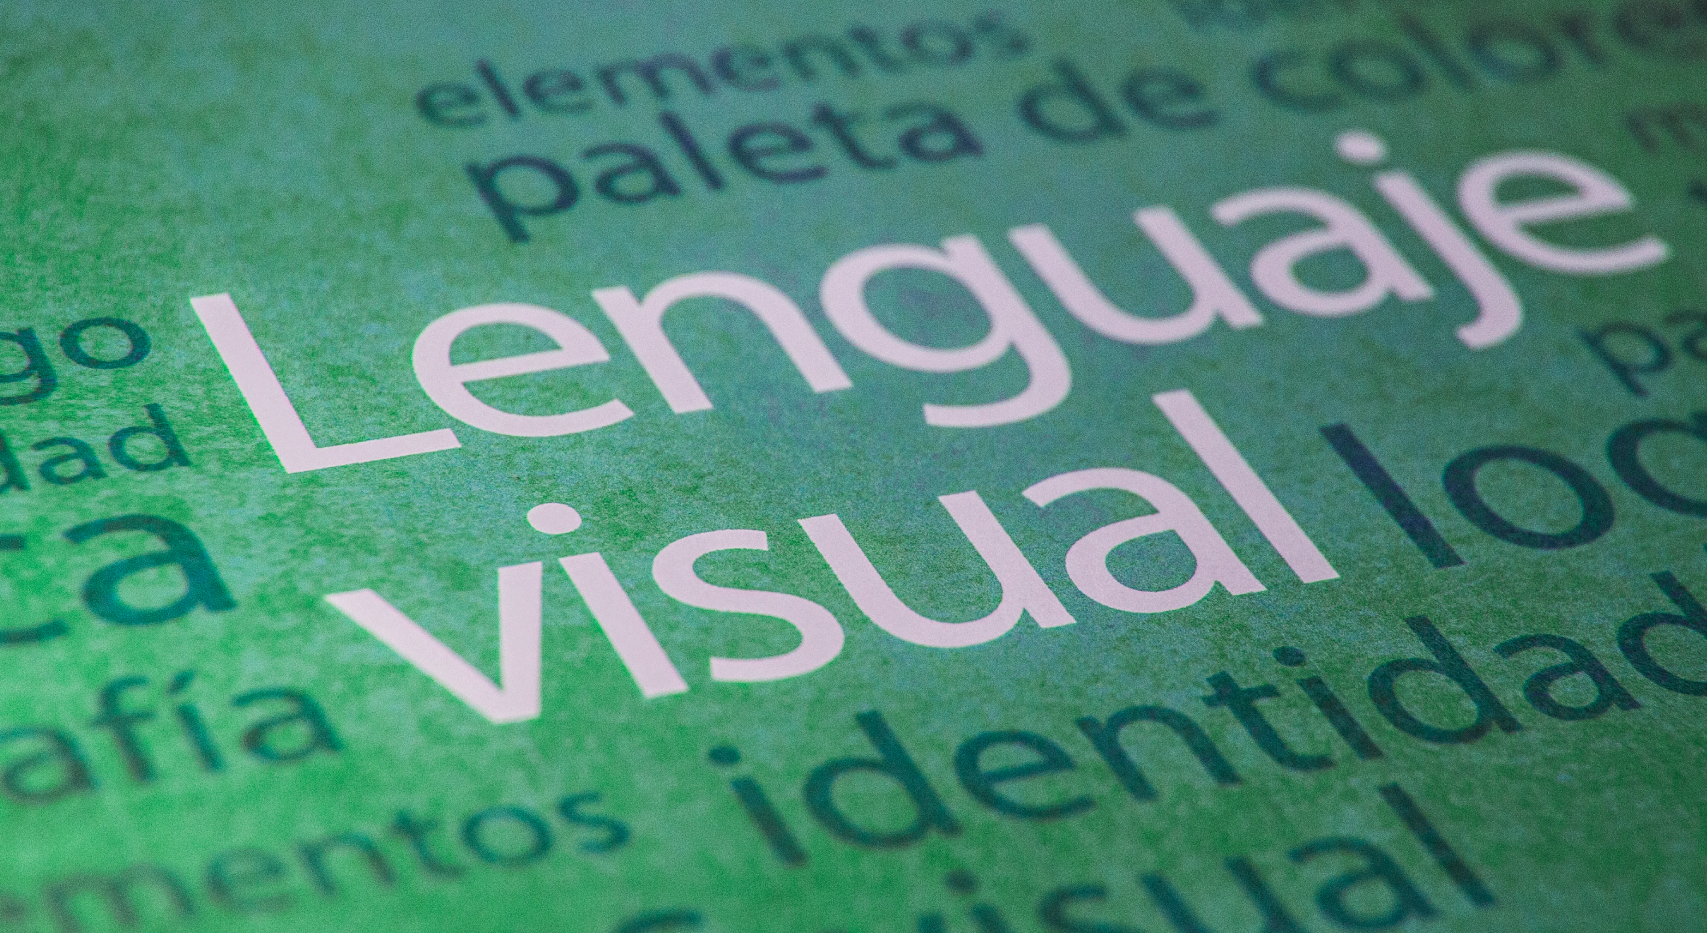 Portada lenguaje visual Kerigma (1)-01.jpg